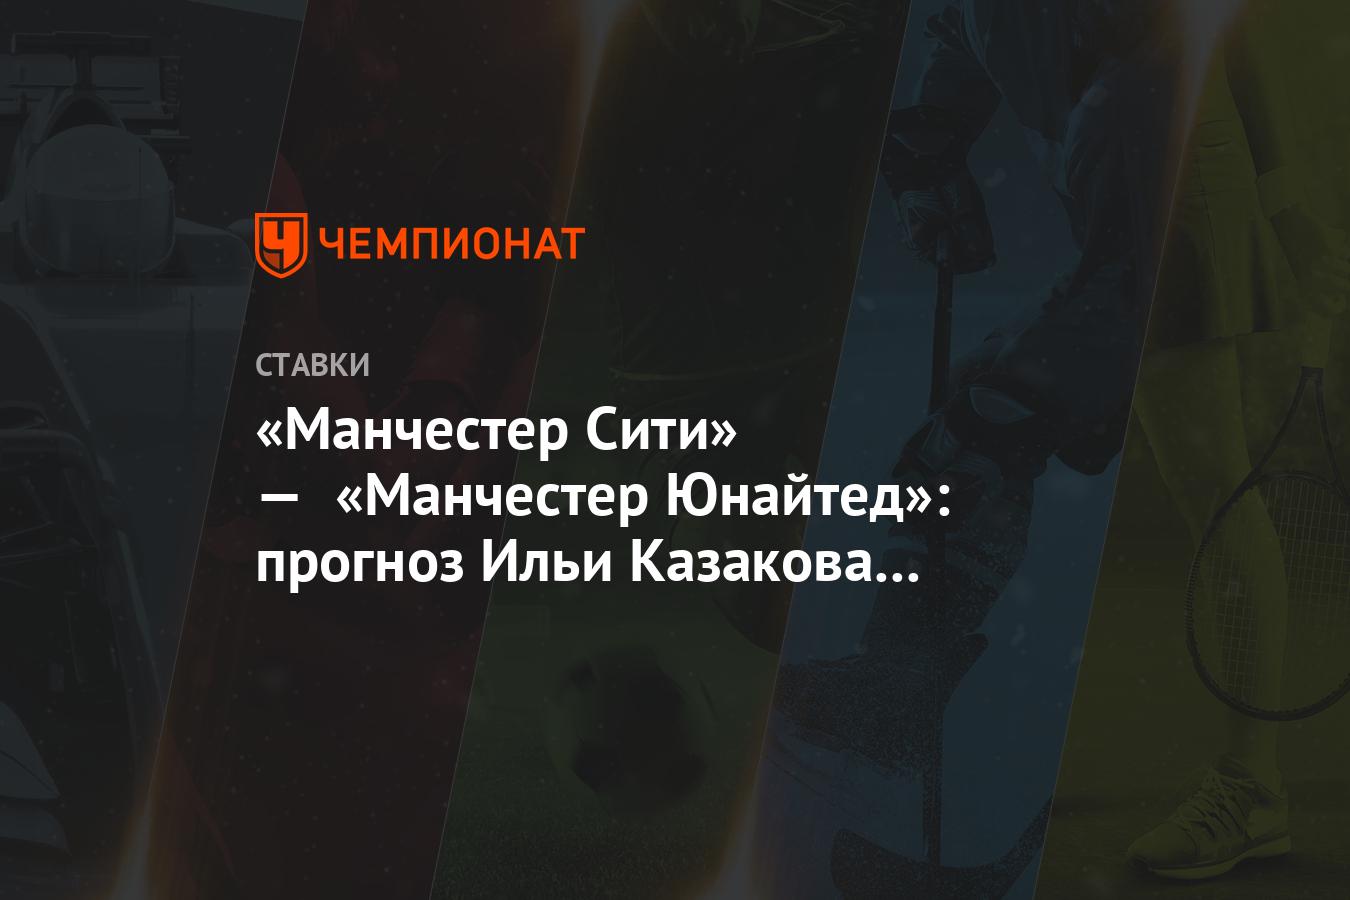 «Манчестер Сити» — «Манчестер Юнайтед»: прогноз Ильи Казакова на матч АПЛ